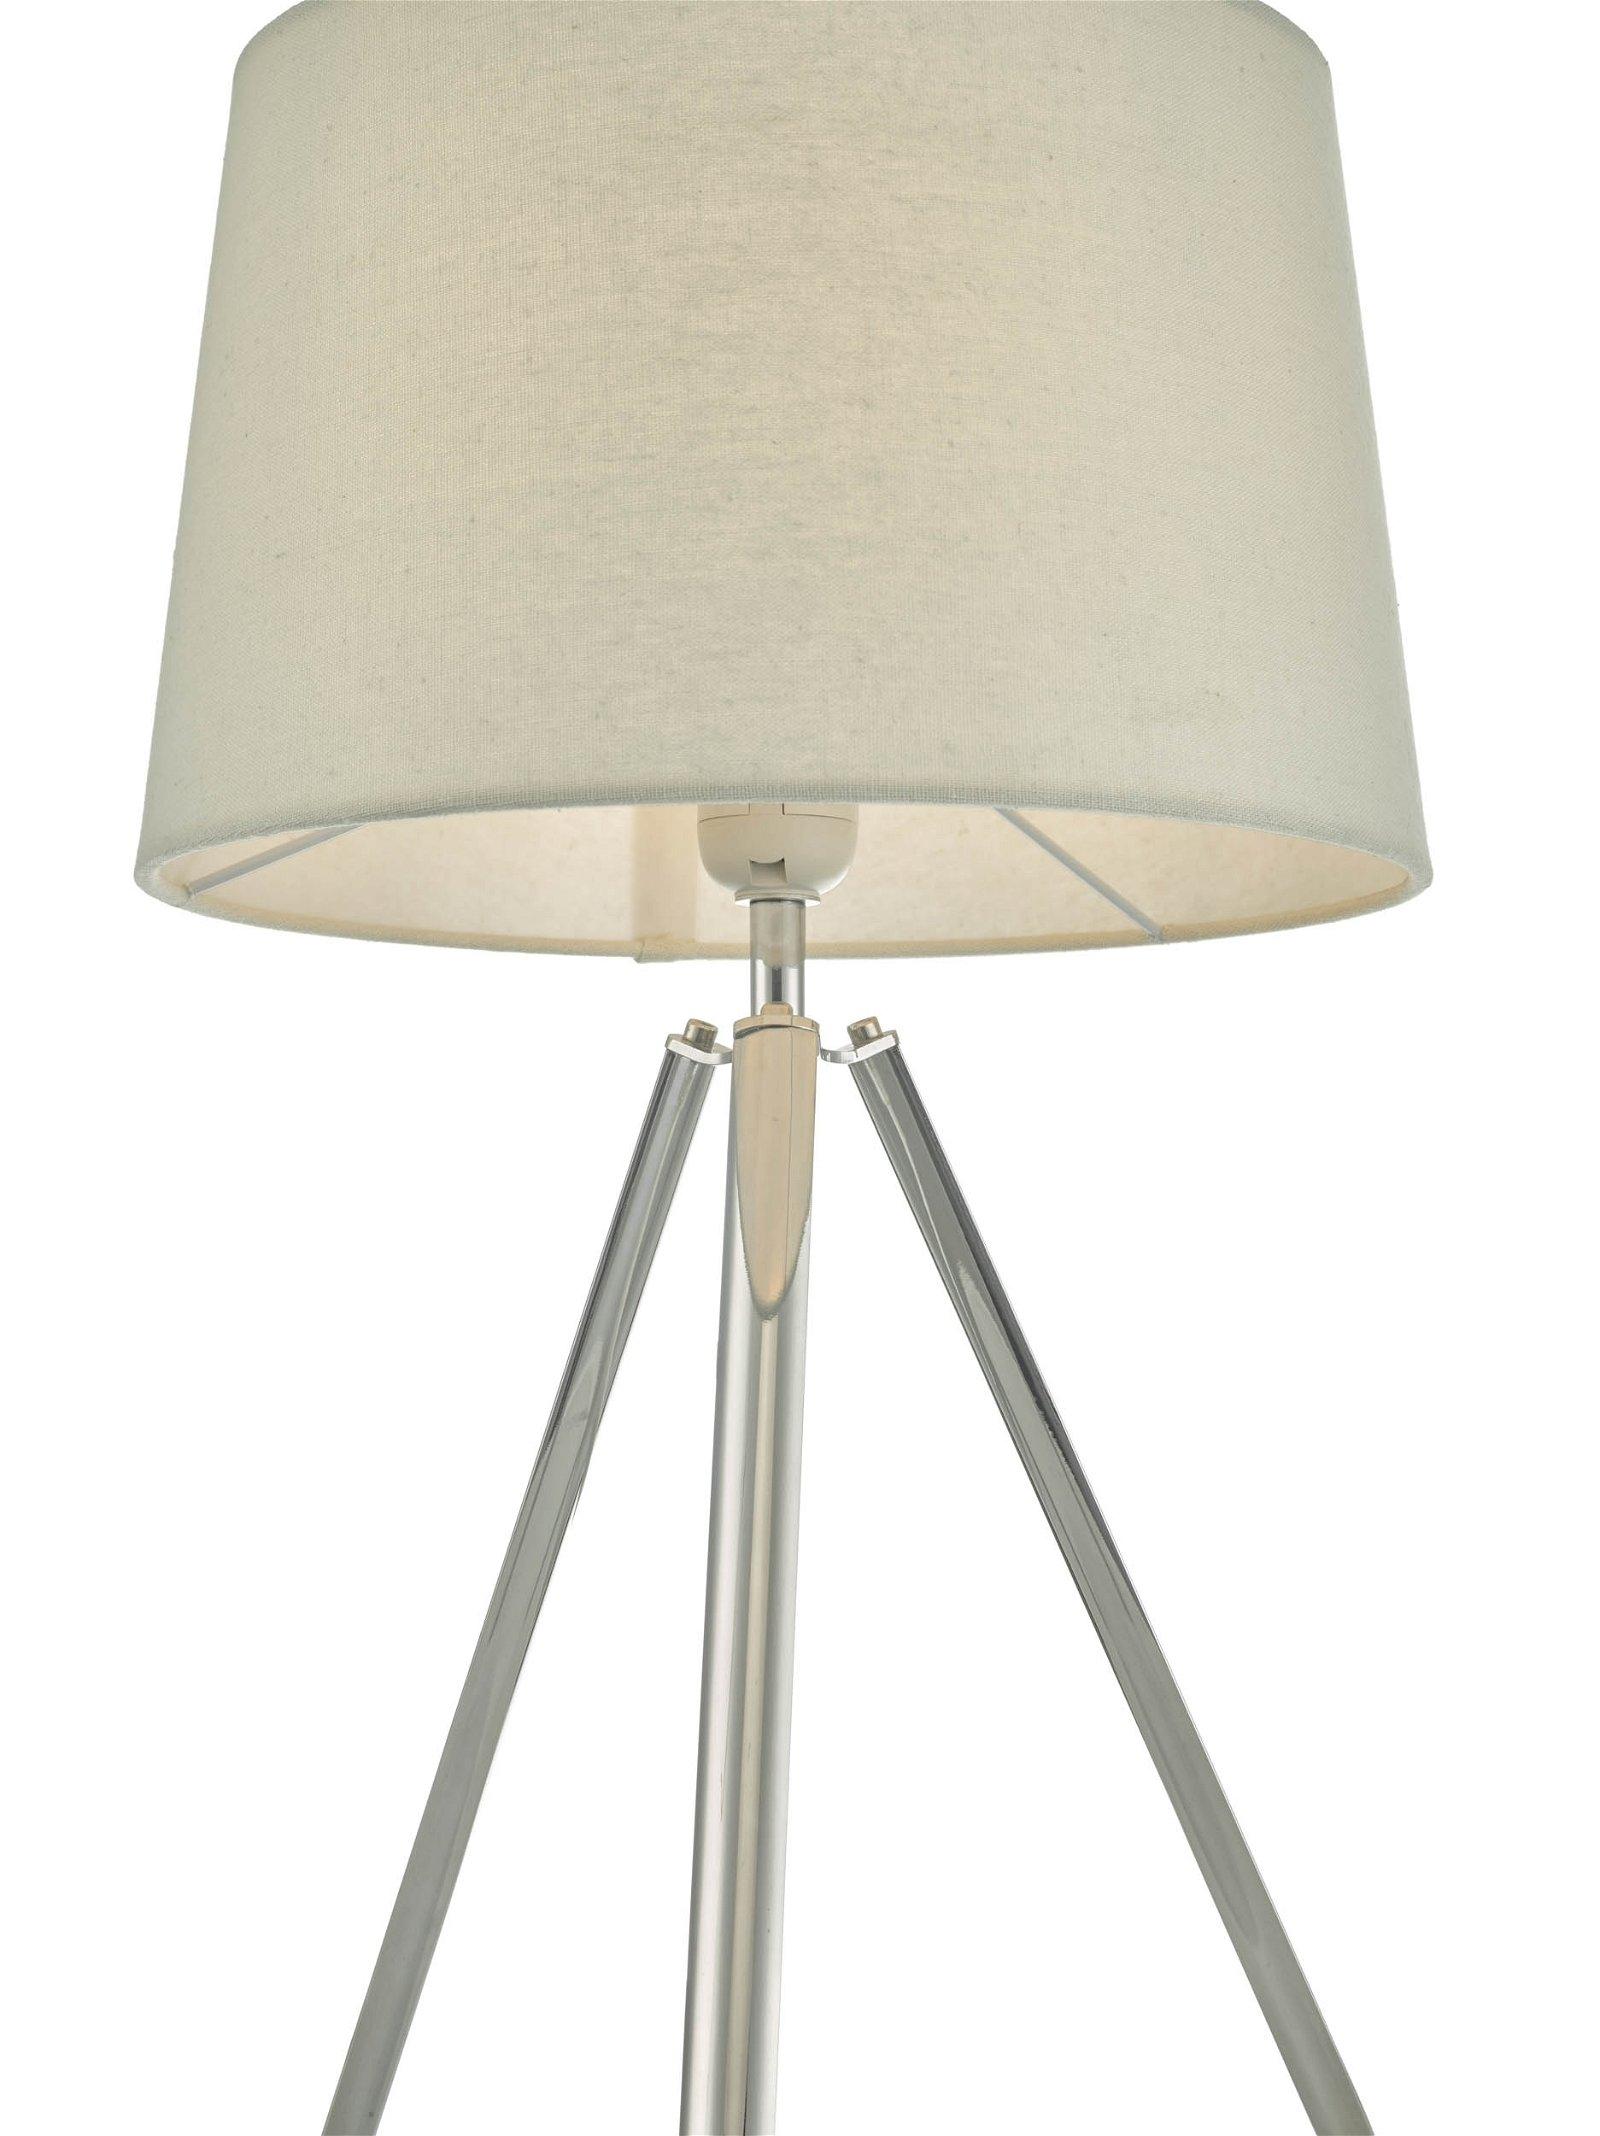 Light Grey Bedside Table: Modern Chrome 50cm Tripod Table Lamp Bedside Light Grey